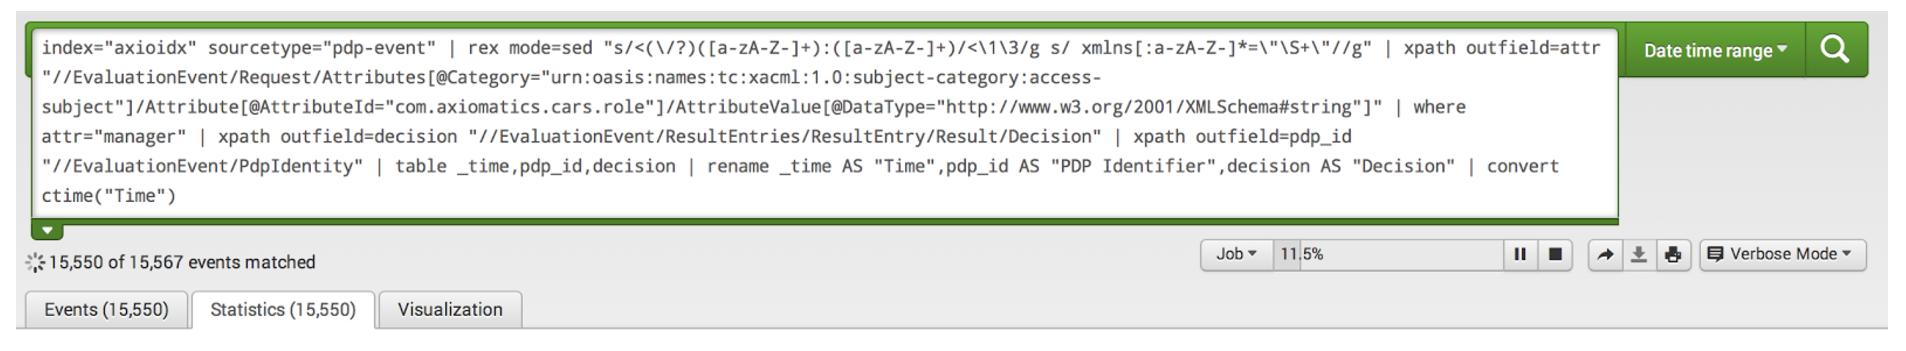 Leveraging Splunk to Aggregate Axiomatics Policy Server Log